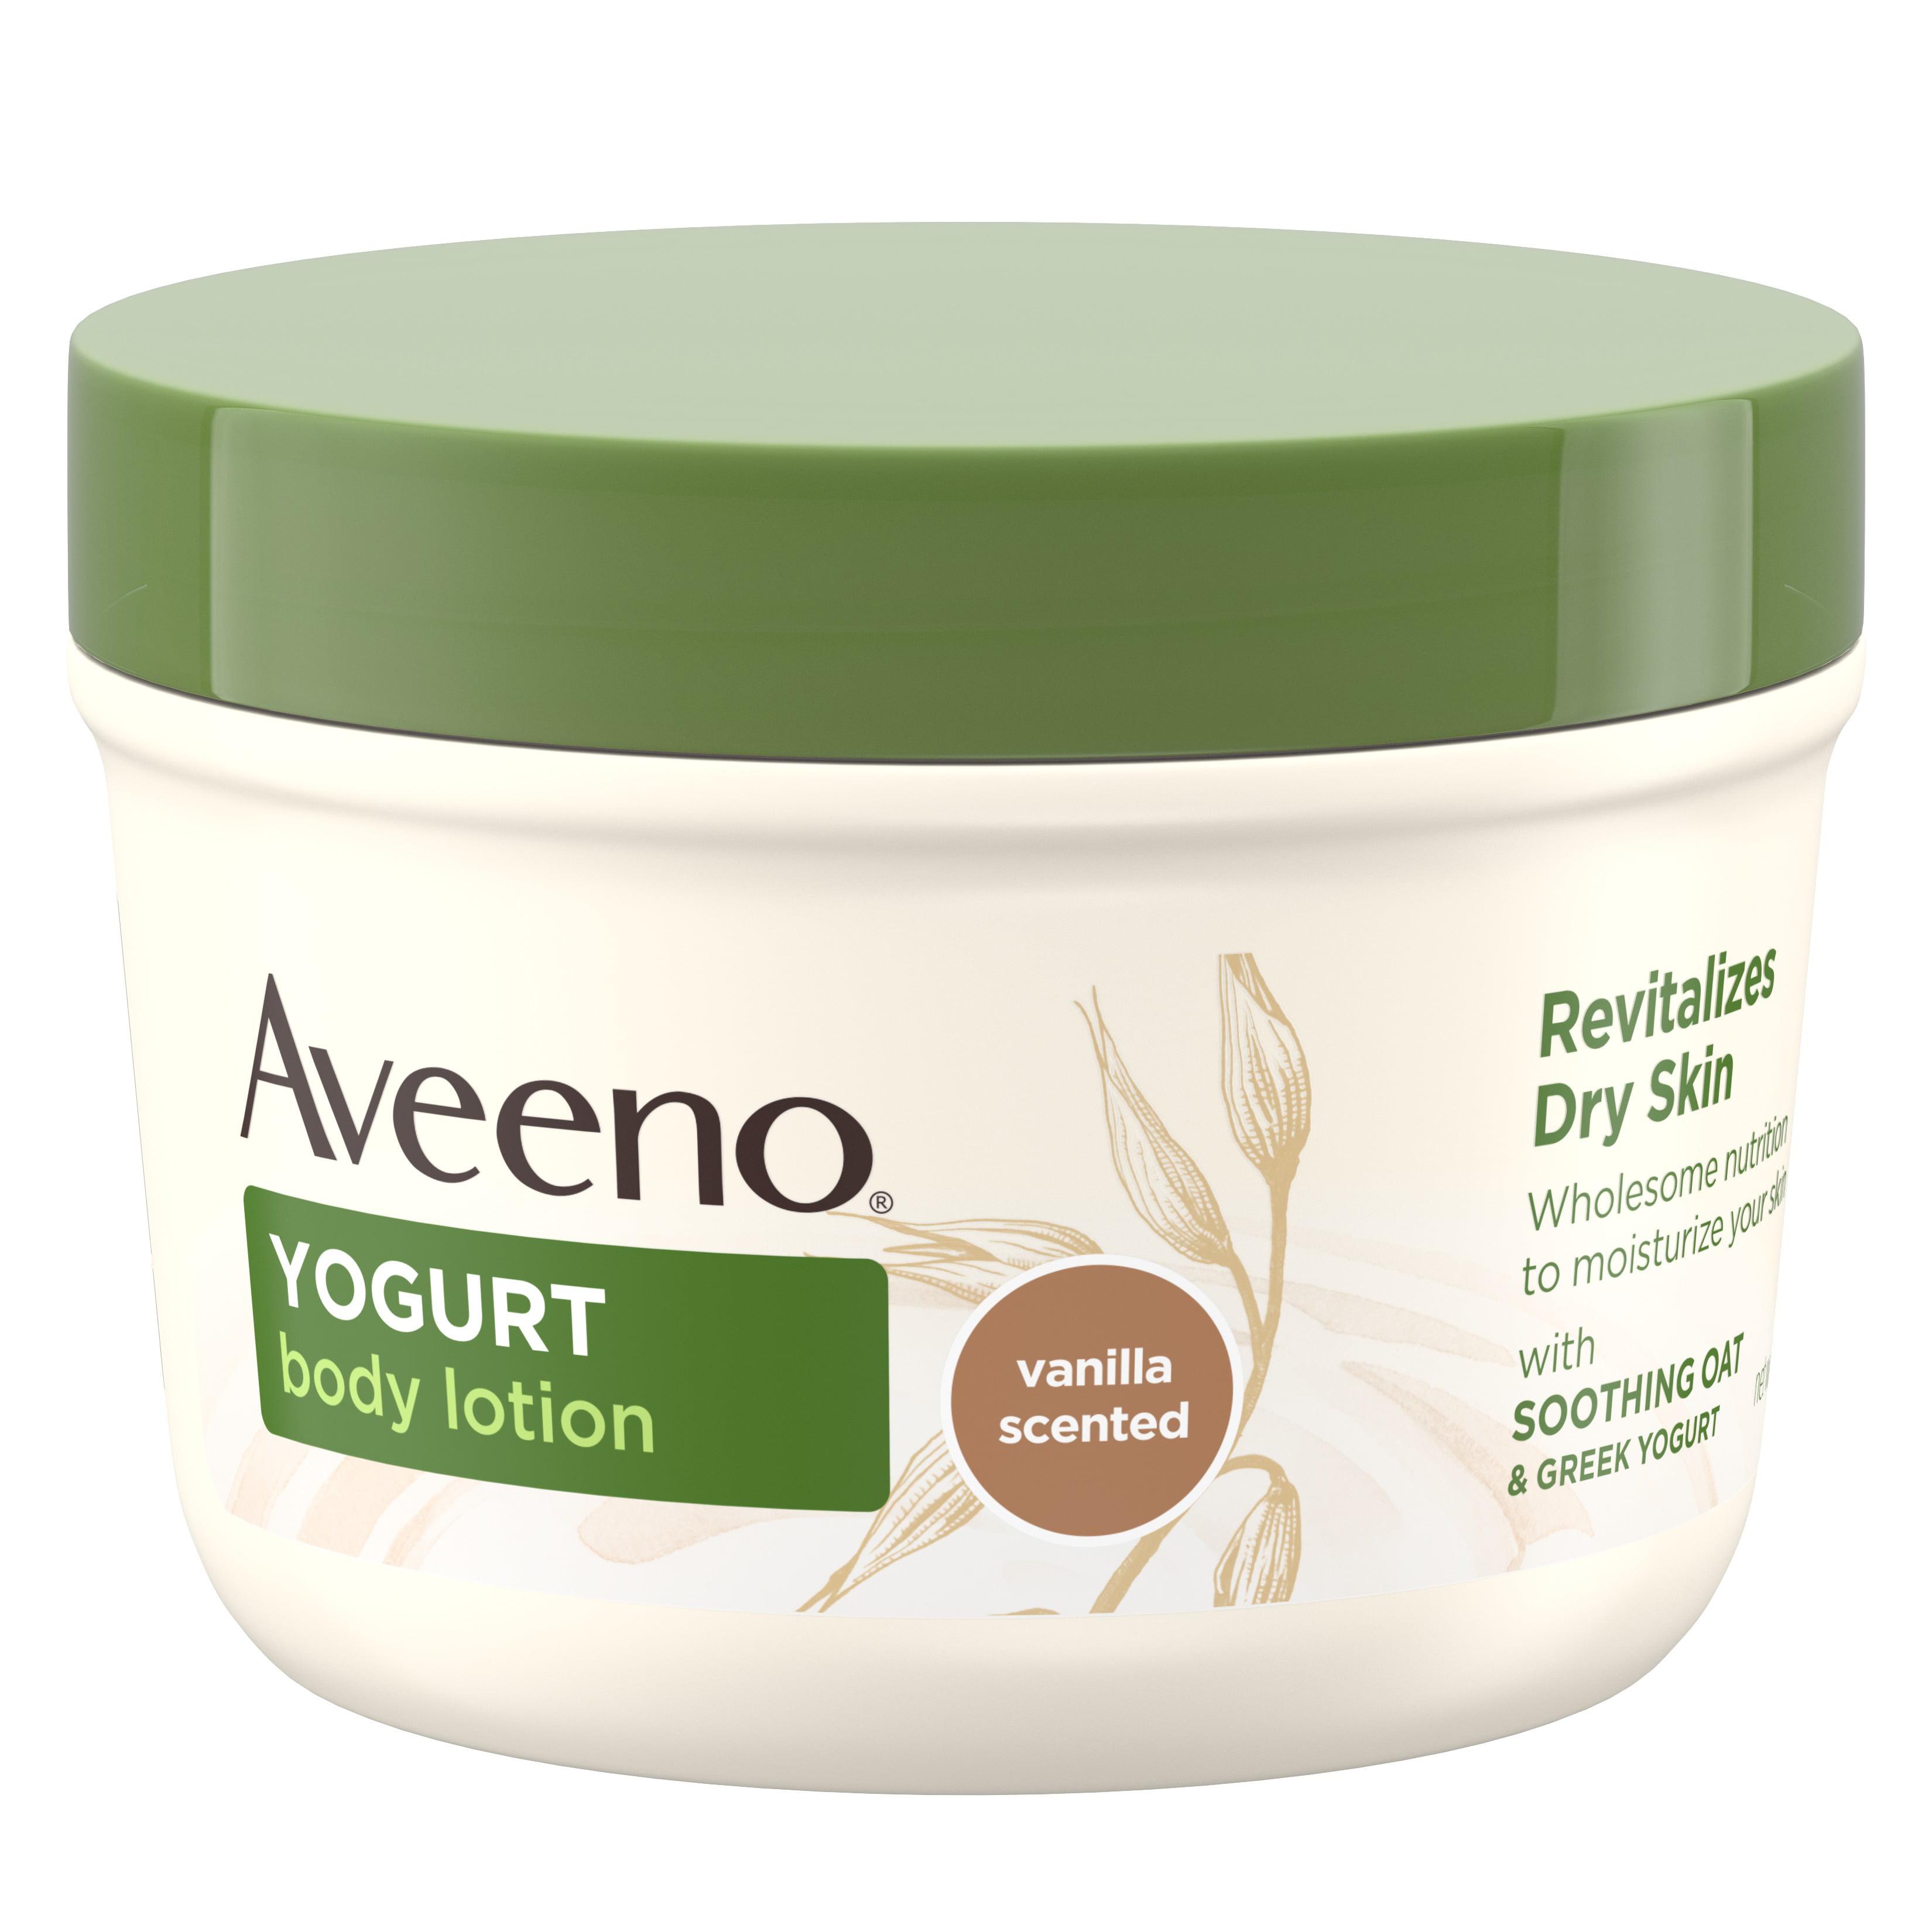 Aveeno Daily Moisturizing Yogurt Body Lotion for Dry Skin, 7 oz